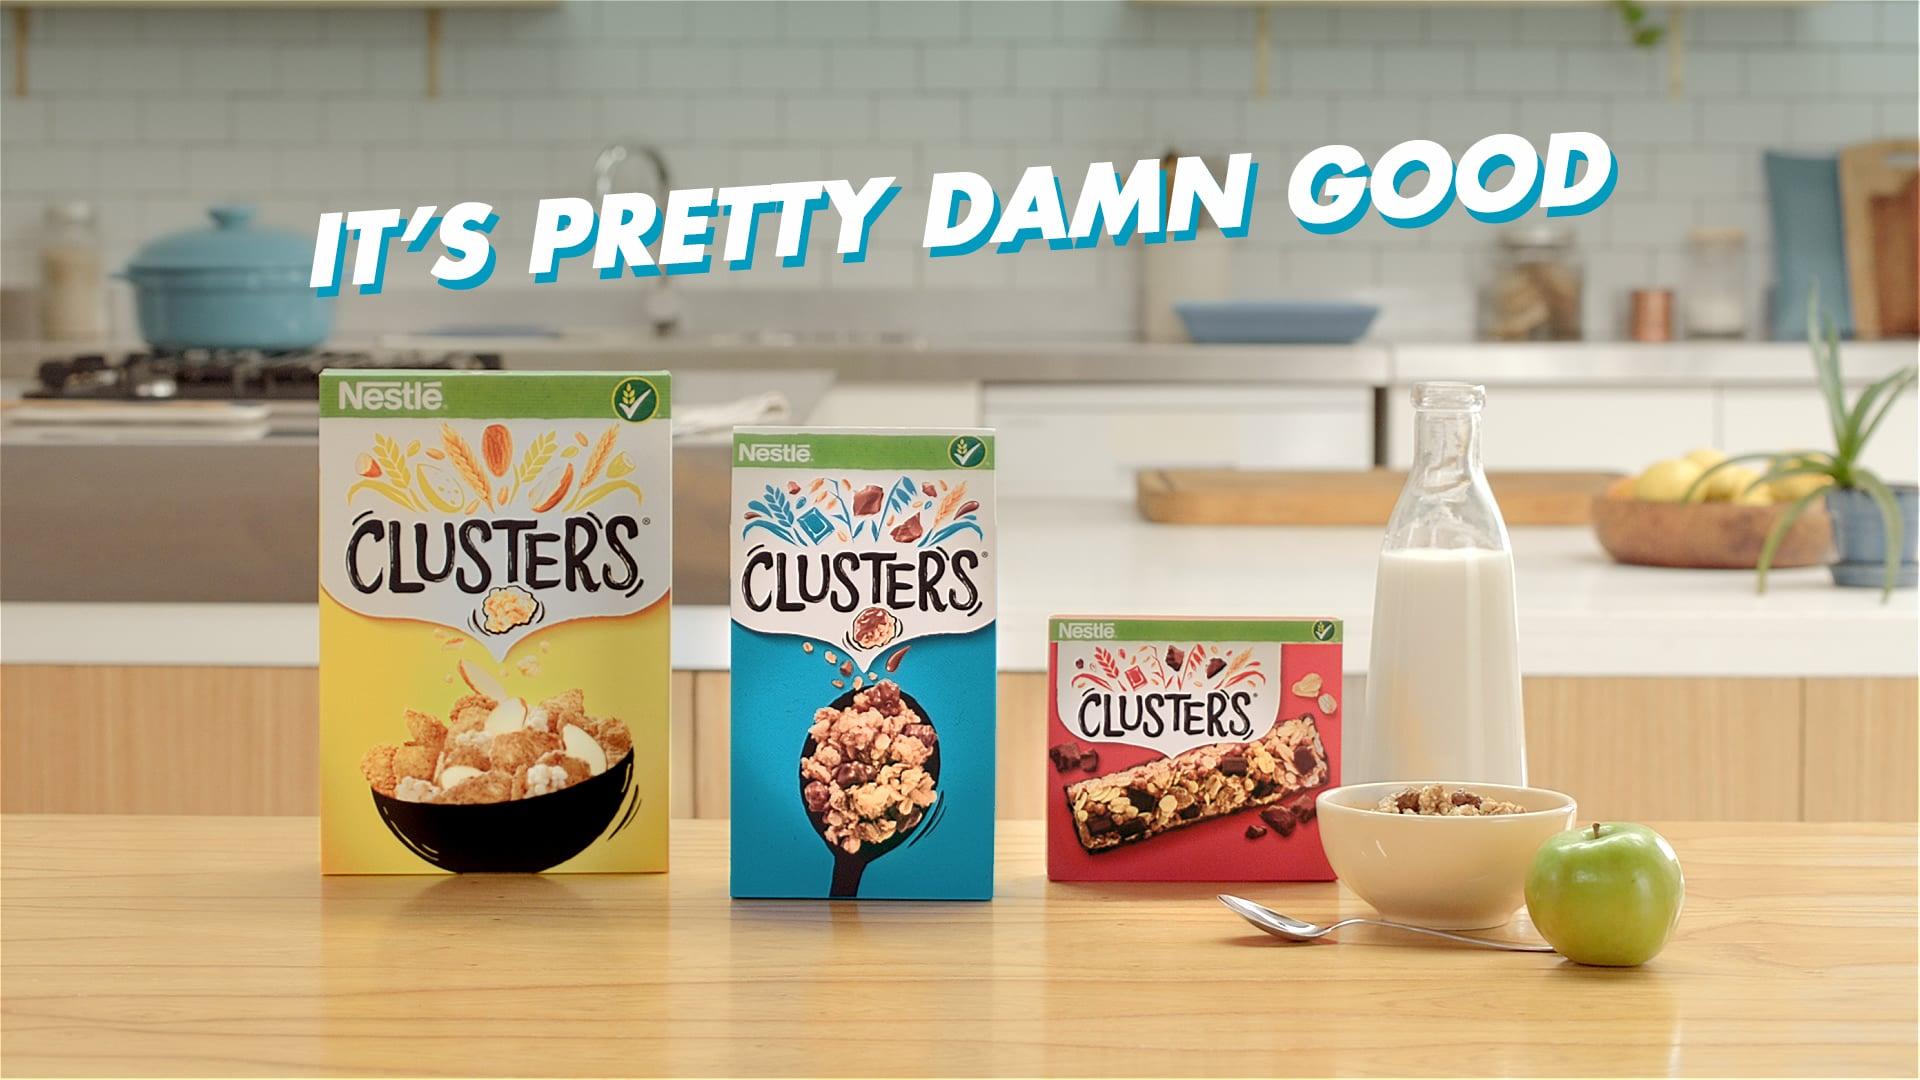 CLUSTER - PRETTY DAMN GOOD